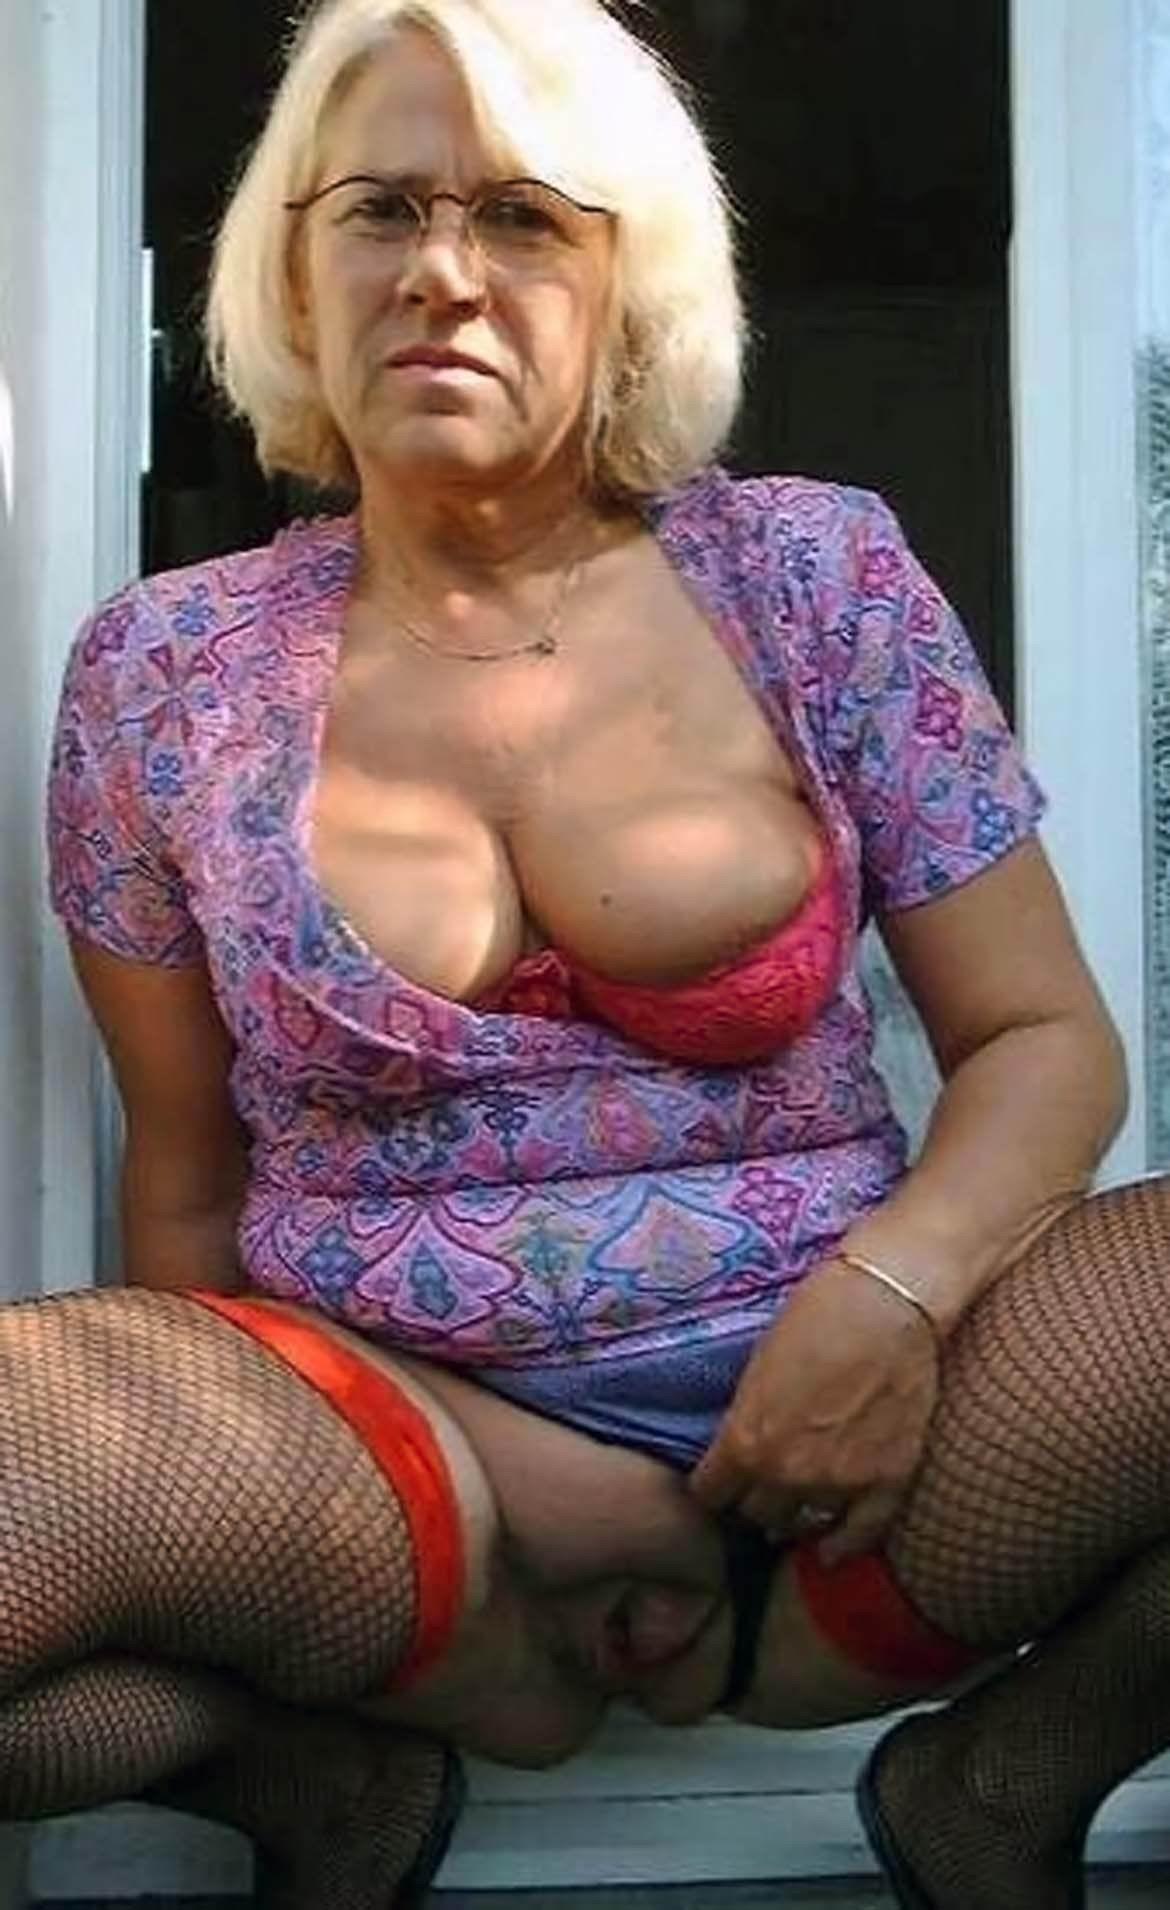 Gallery granny porn Granny Pussy